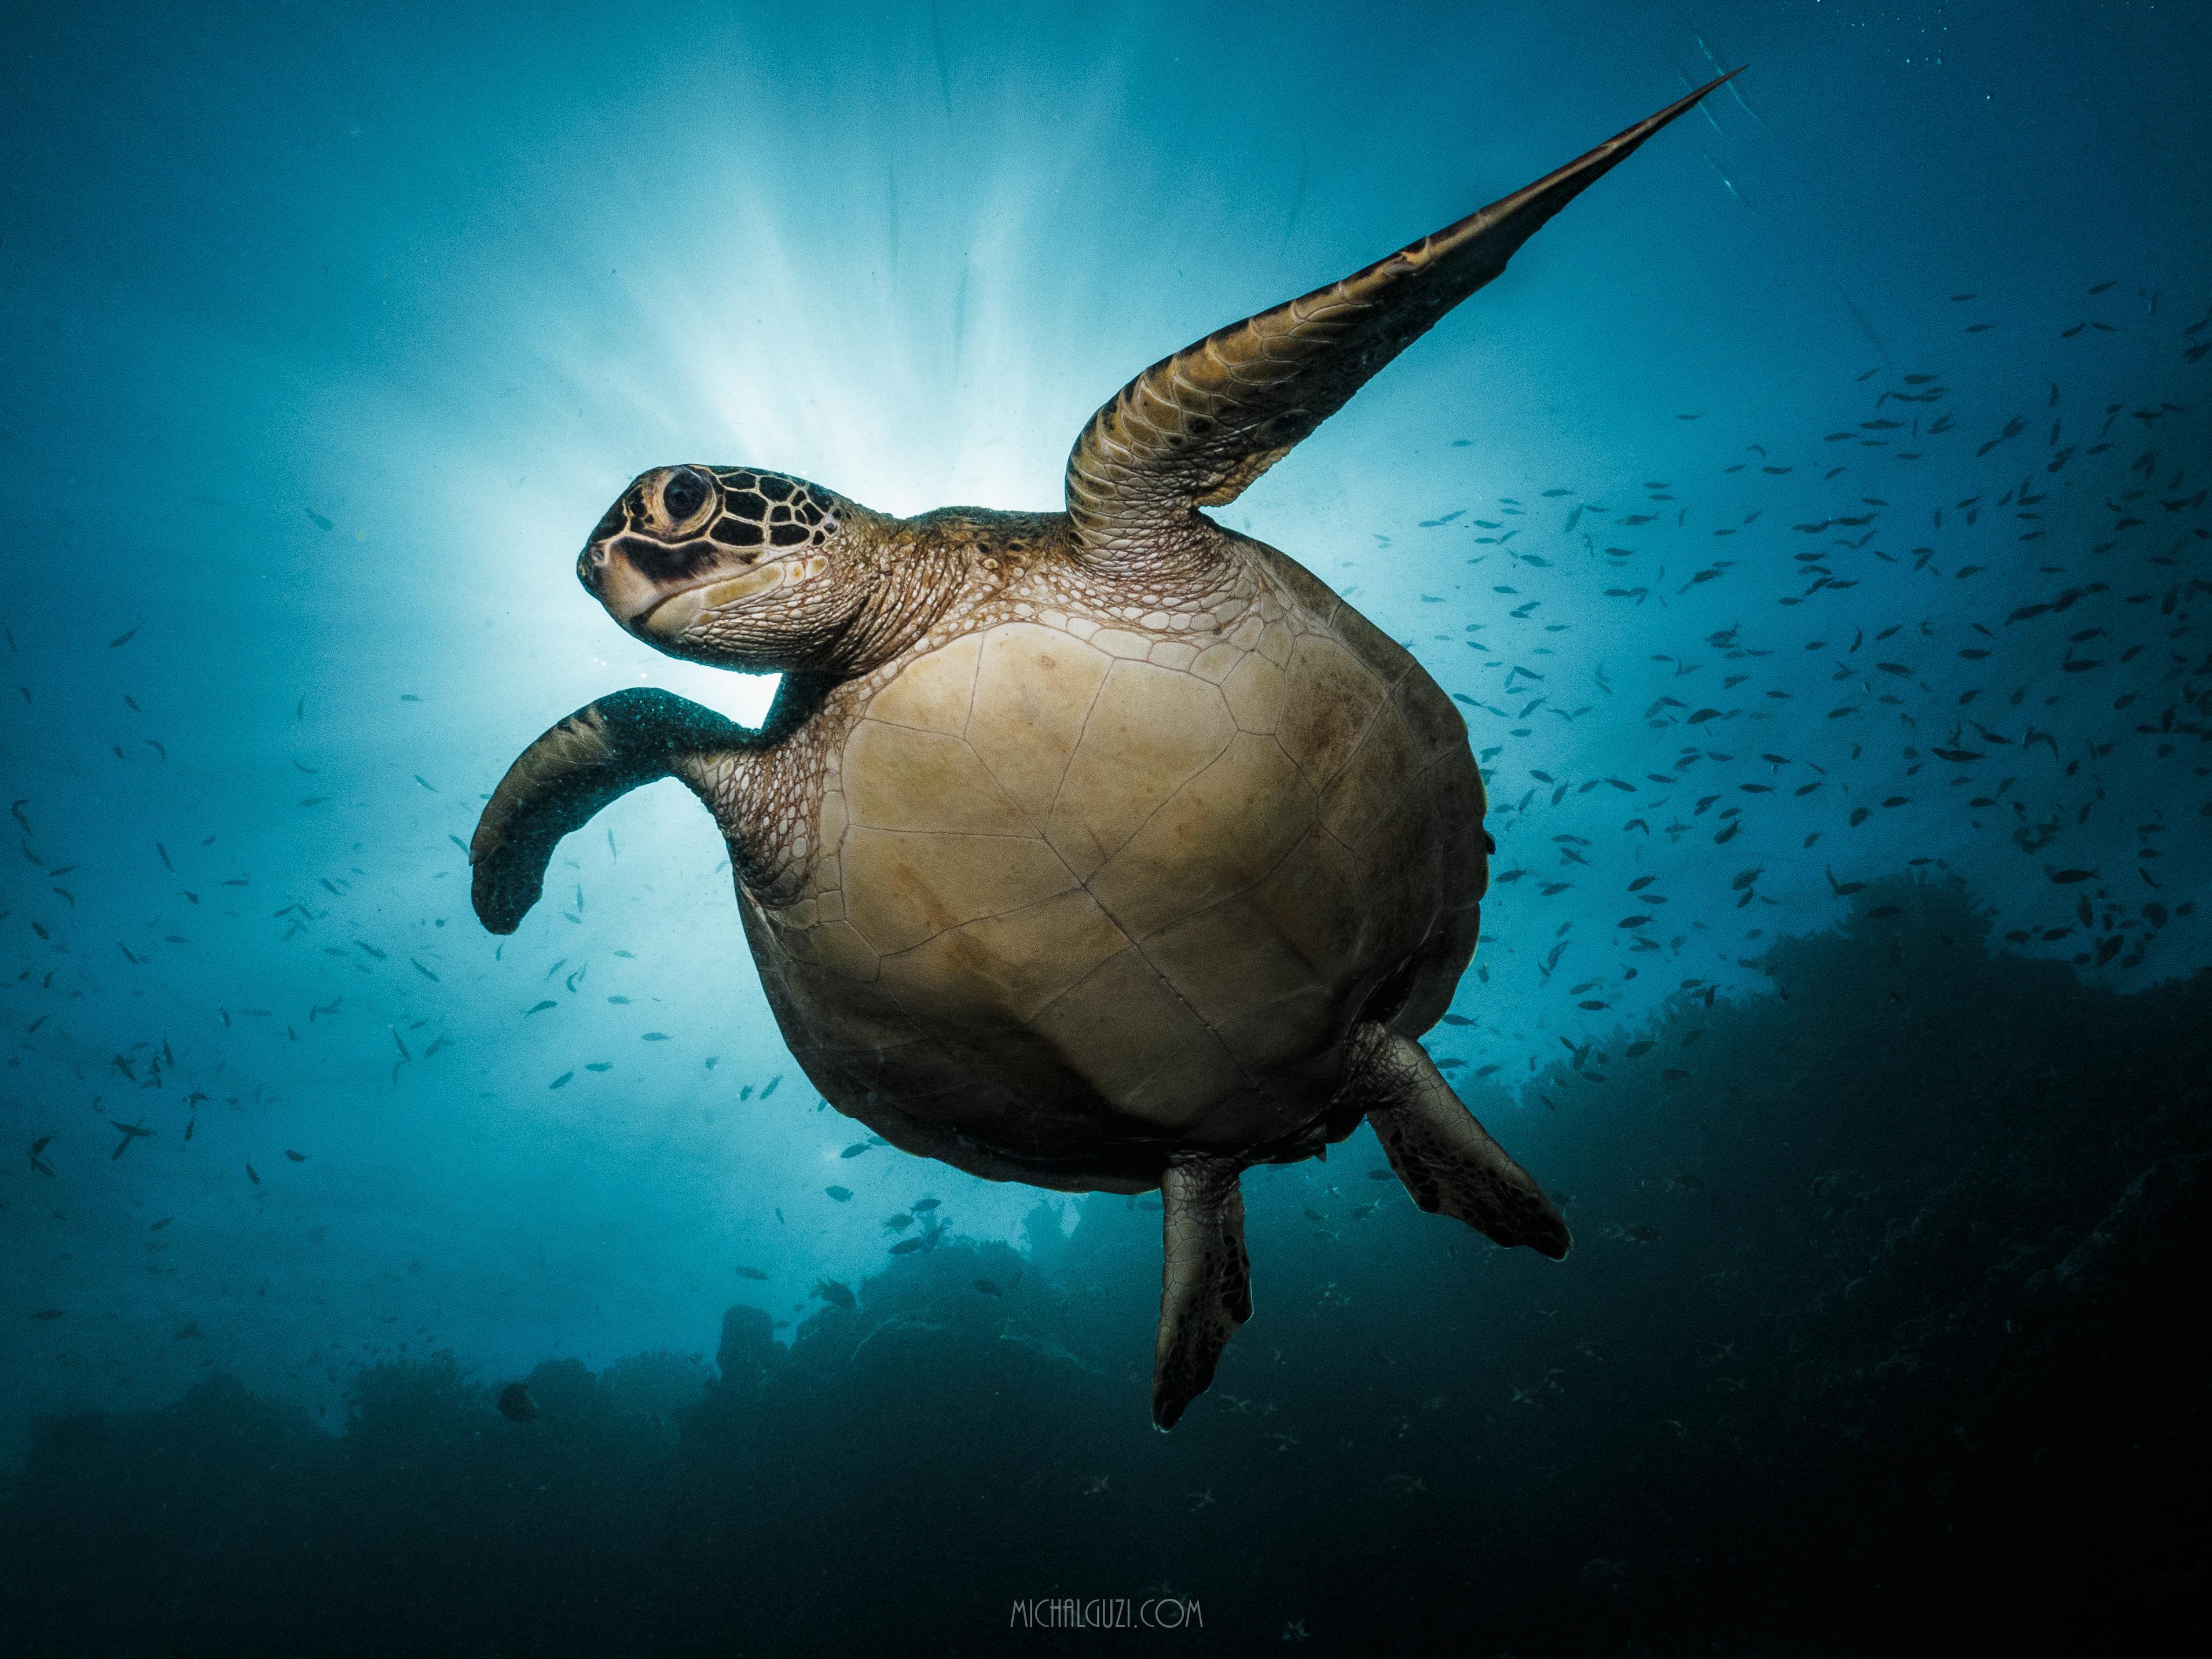 A sea turtle at the Turtle Marine Sanctuary in Cebu